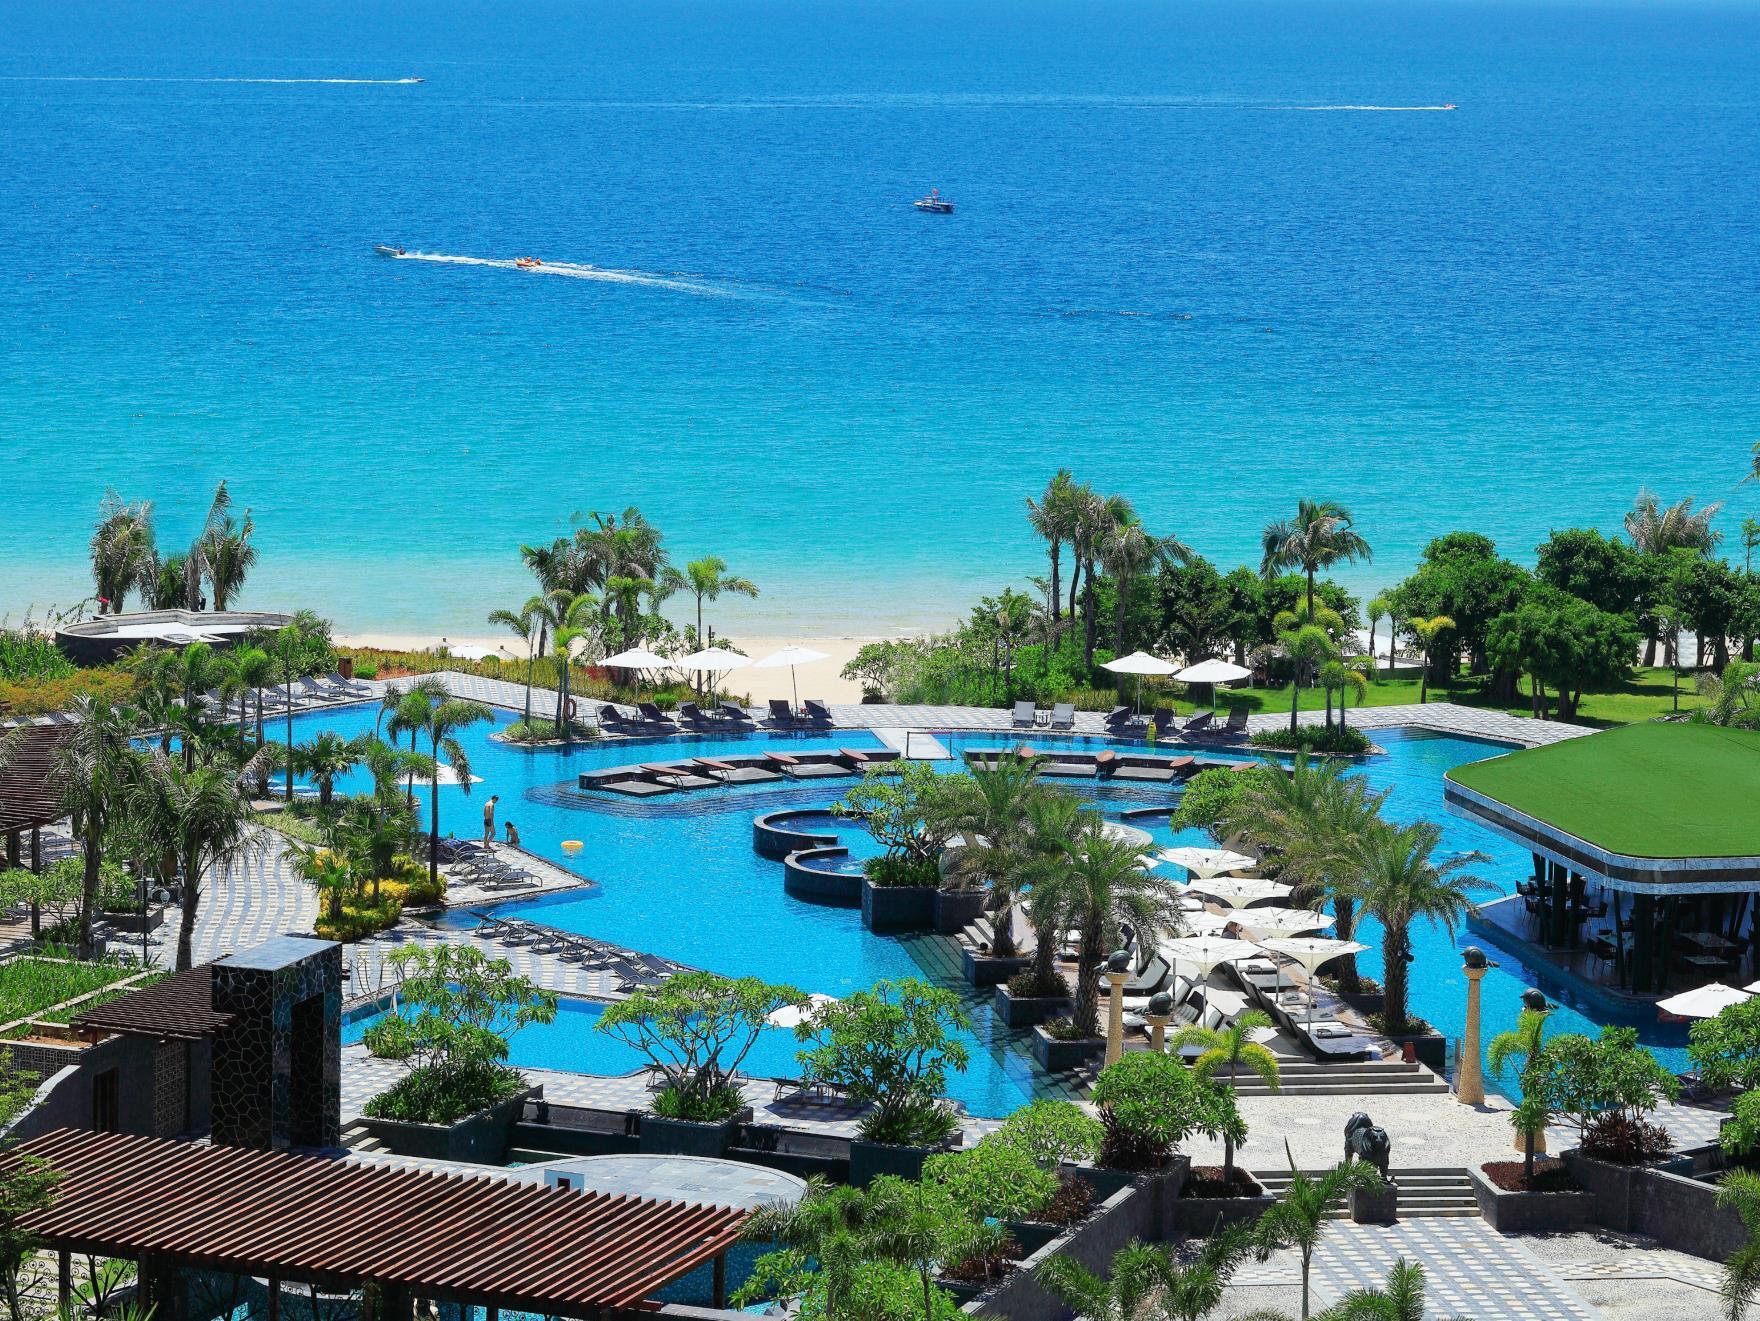 10 best sanya hotels hd photos reviews of hotels in sanya china rh agoda com